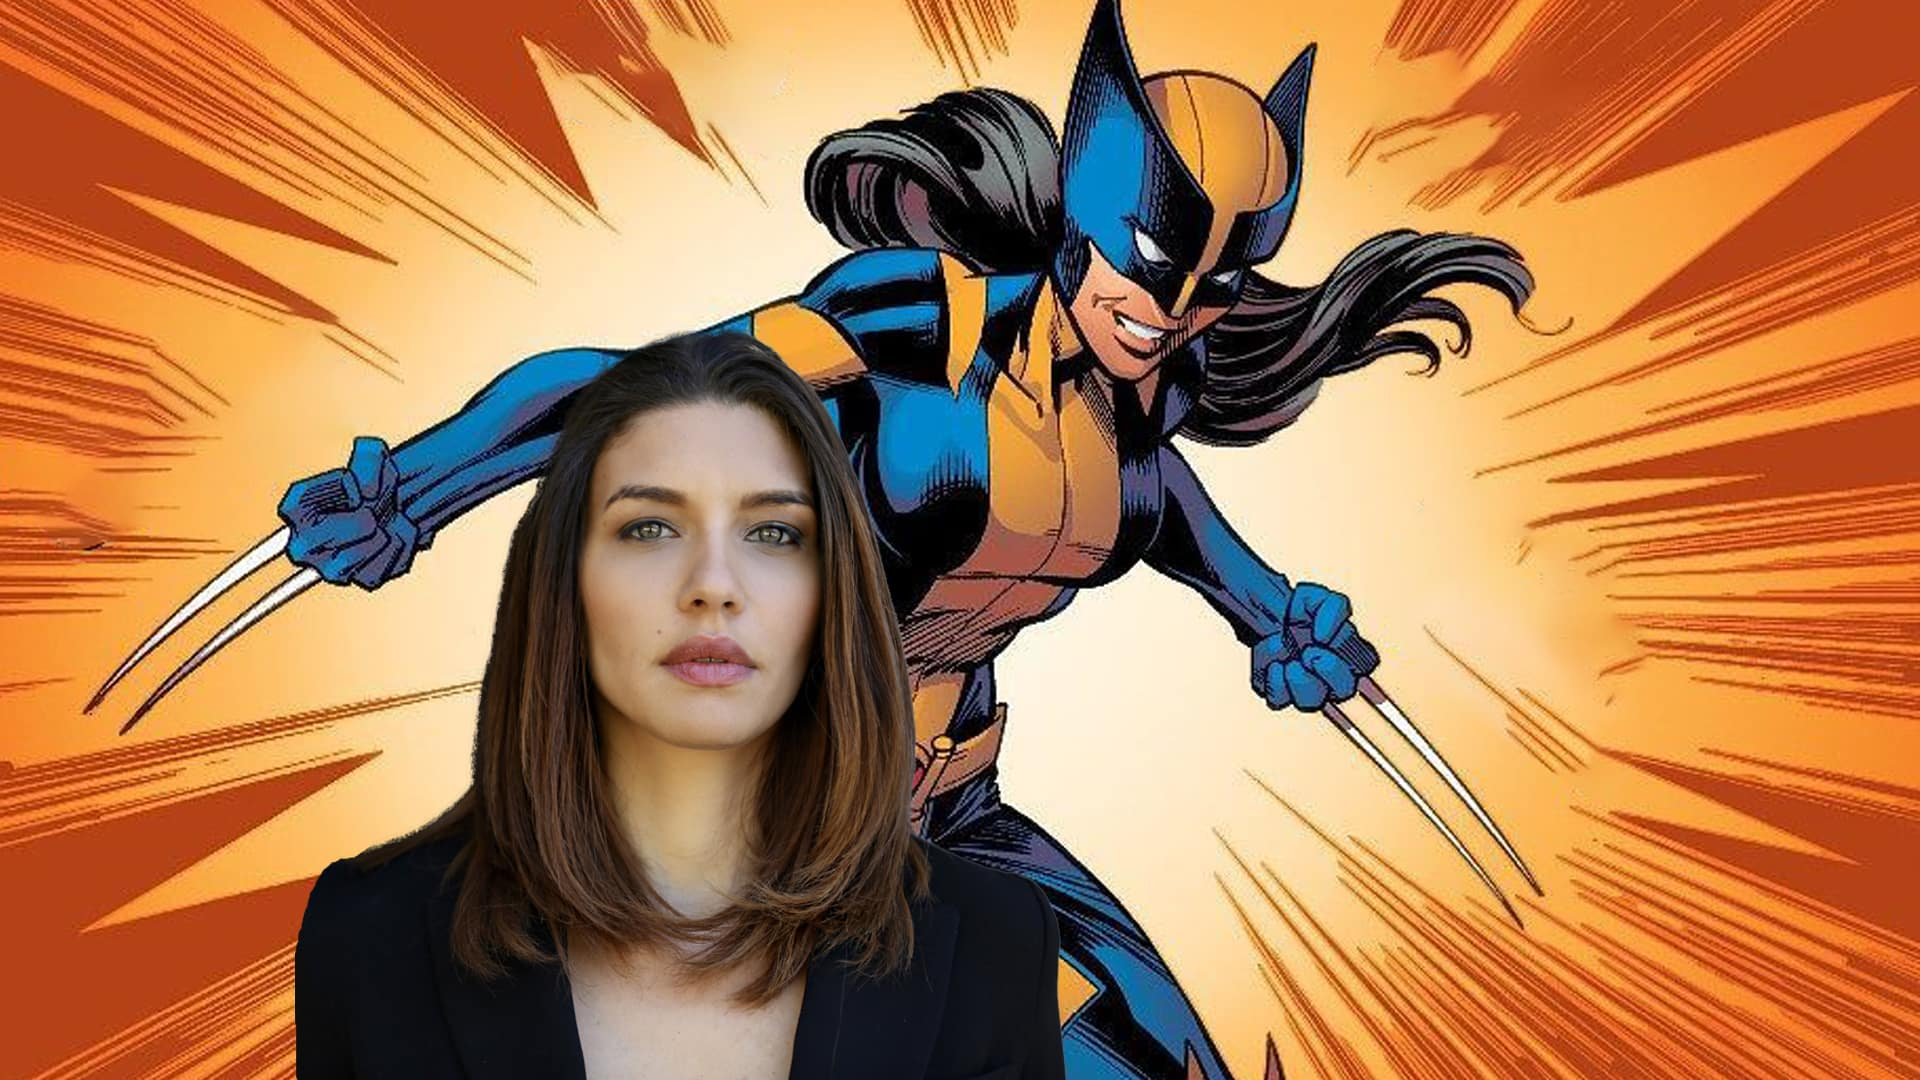 Black Canary ako X-23